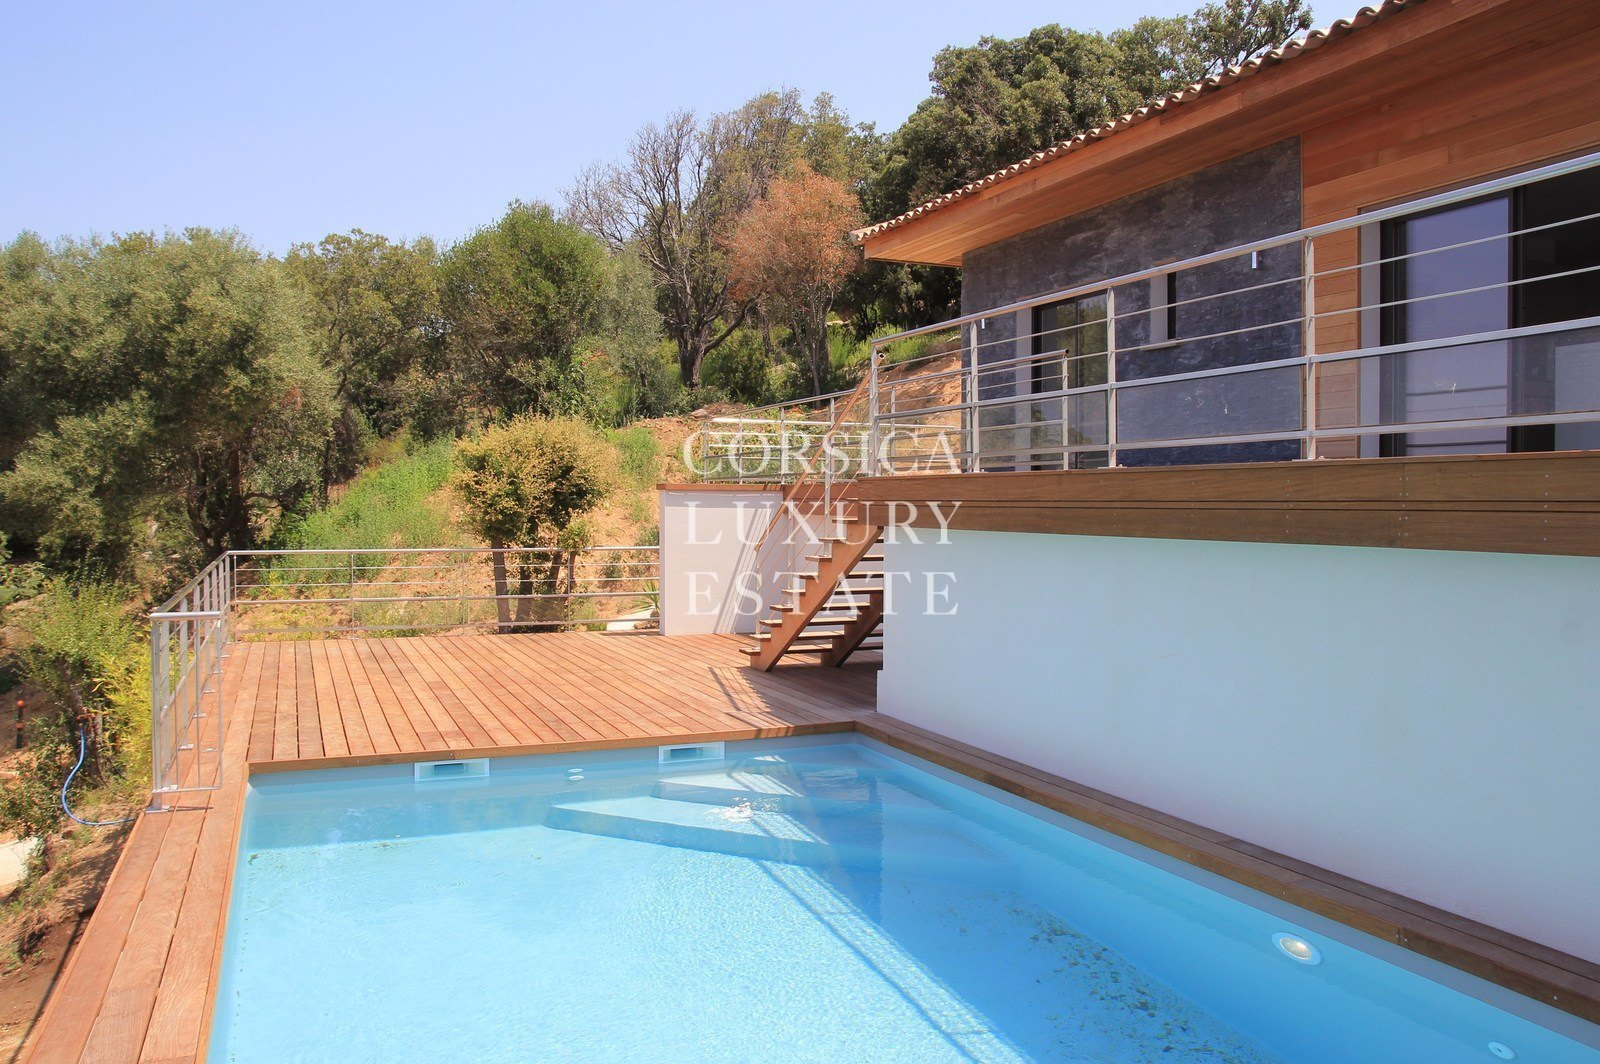 A vendre villa neuve rive sud du golfe d 39 ajaccio vue mer for Villa neuve